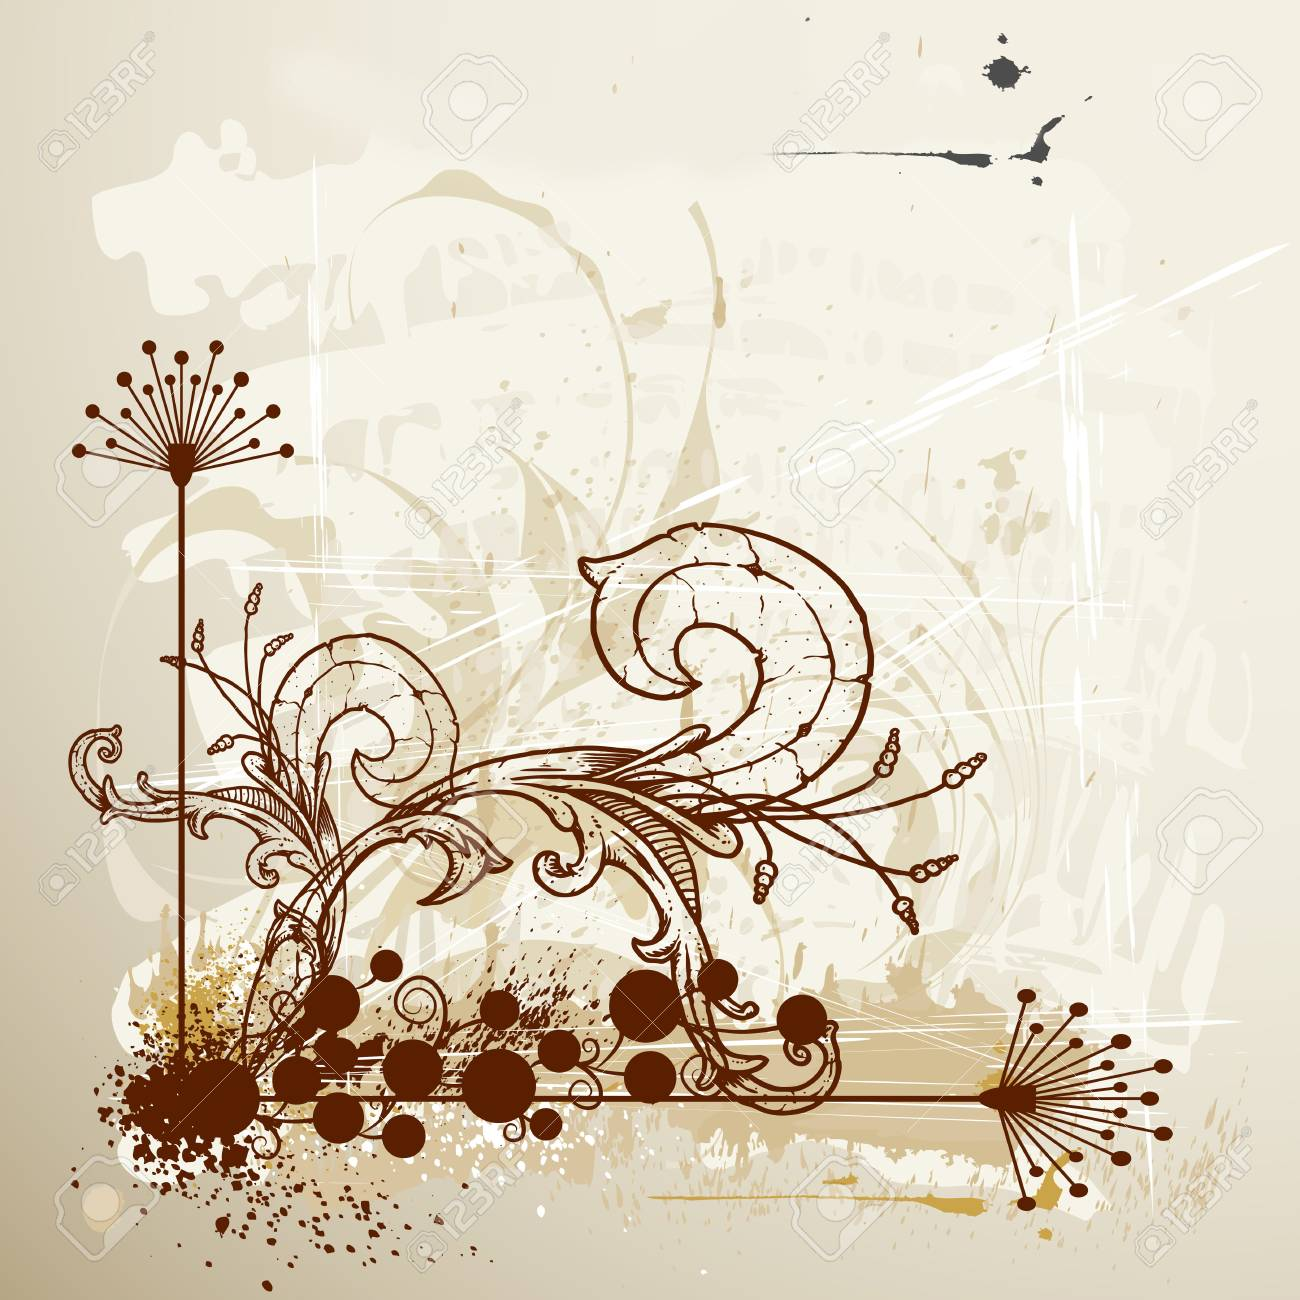 Grunge floral background Stock Vector - 15660370